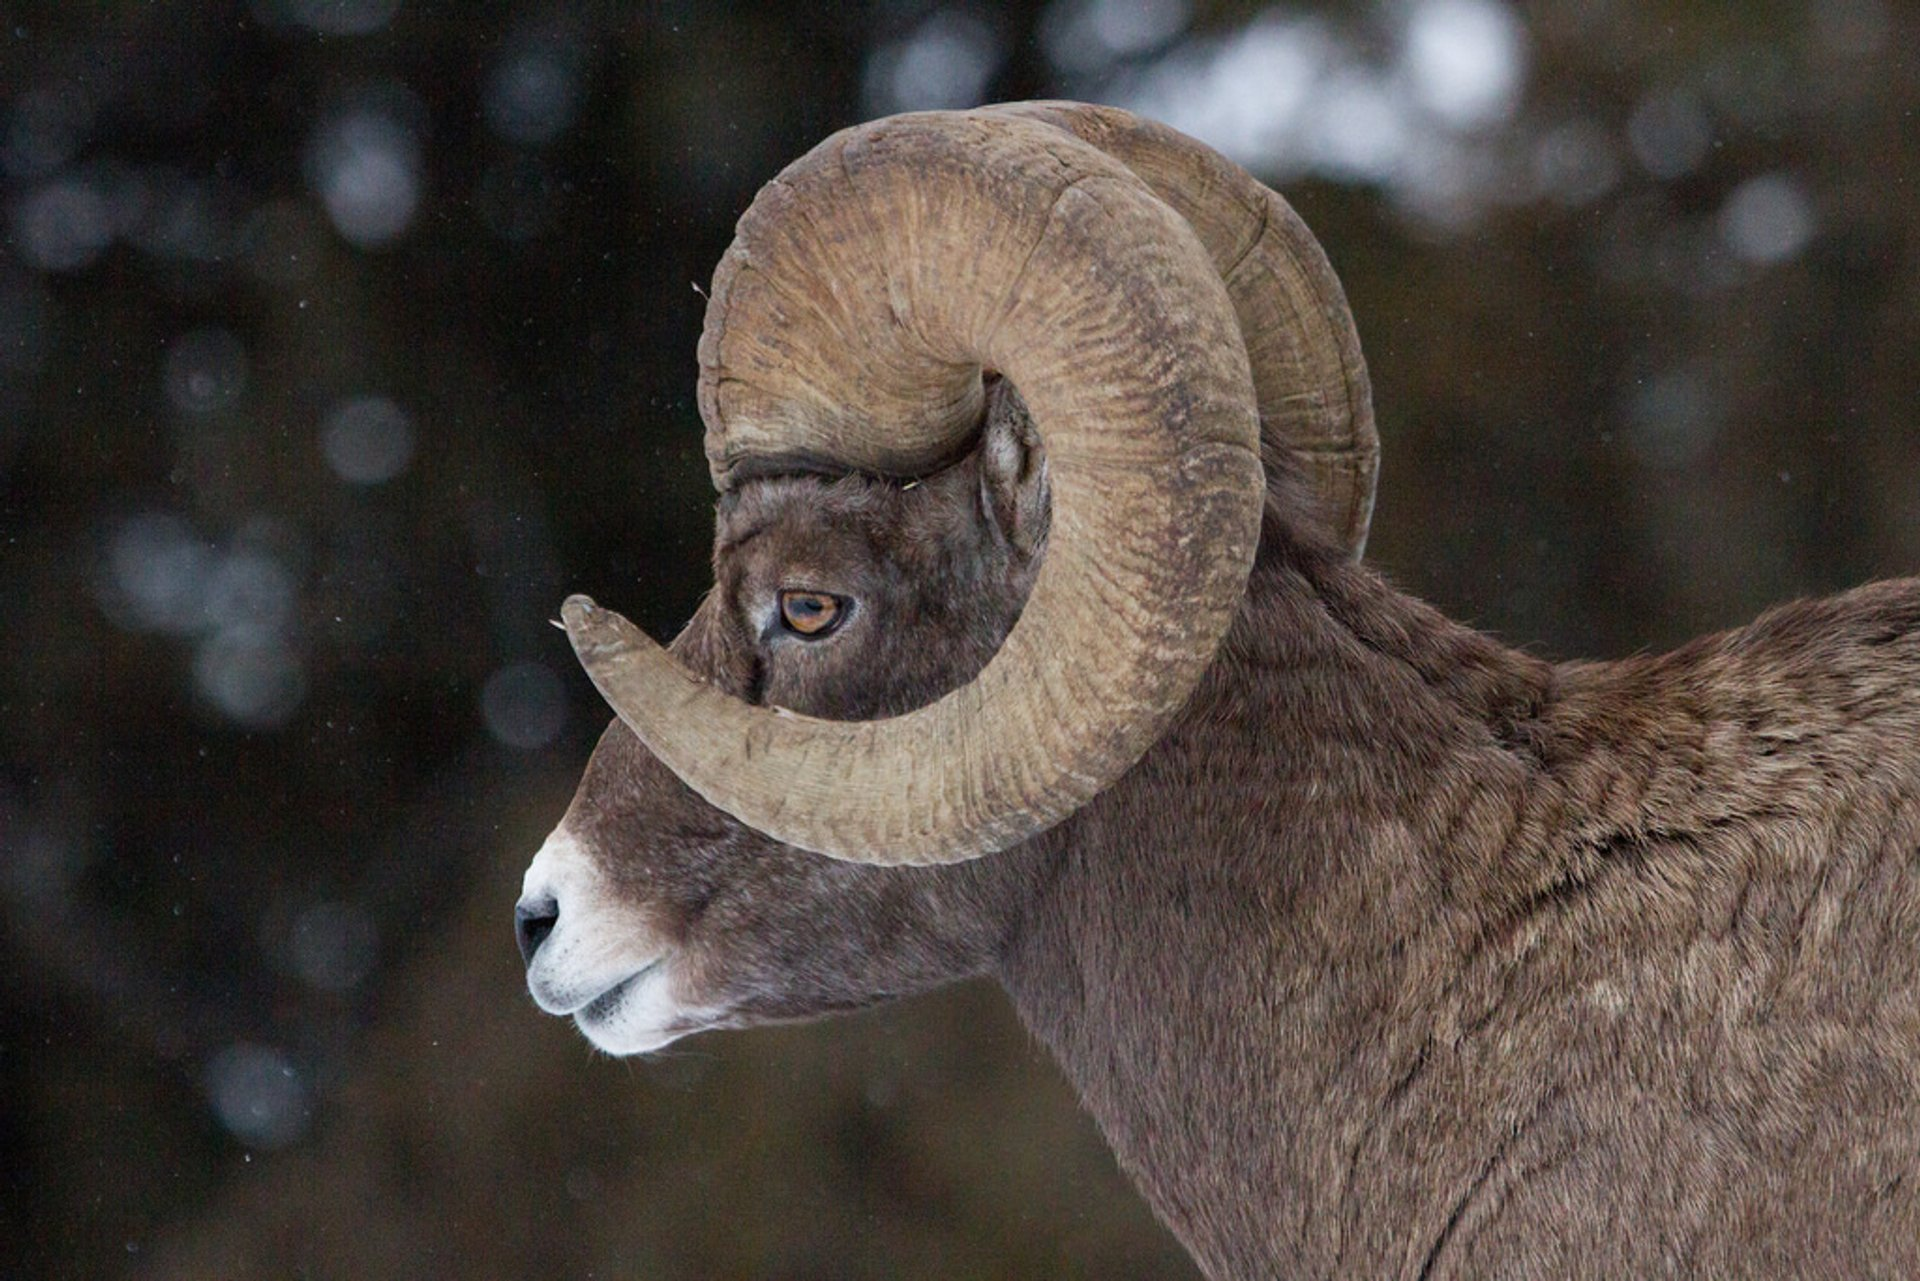 Bighorn Sheep in Yellowstone National Park - Best Season 2020